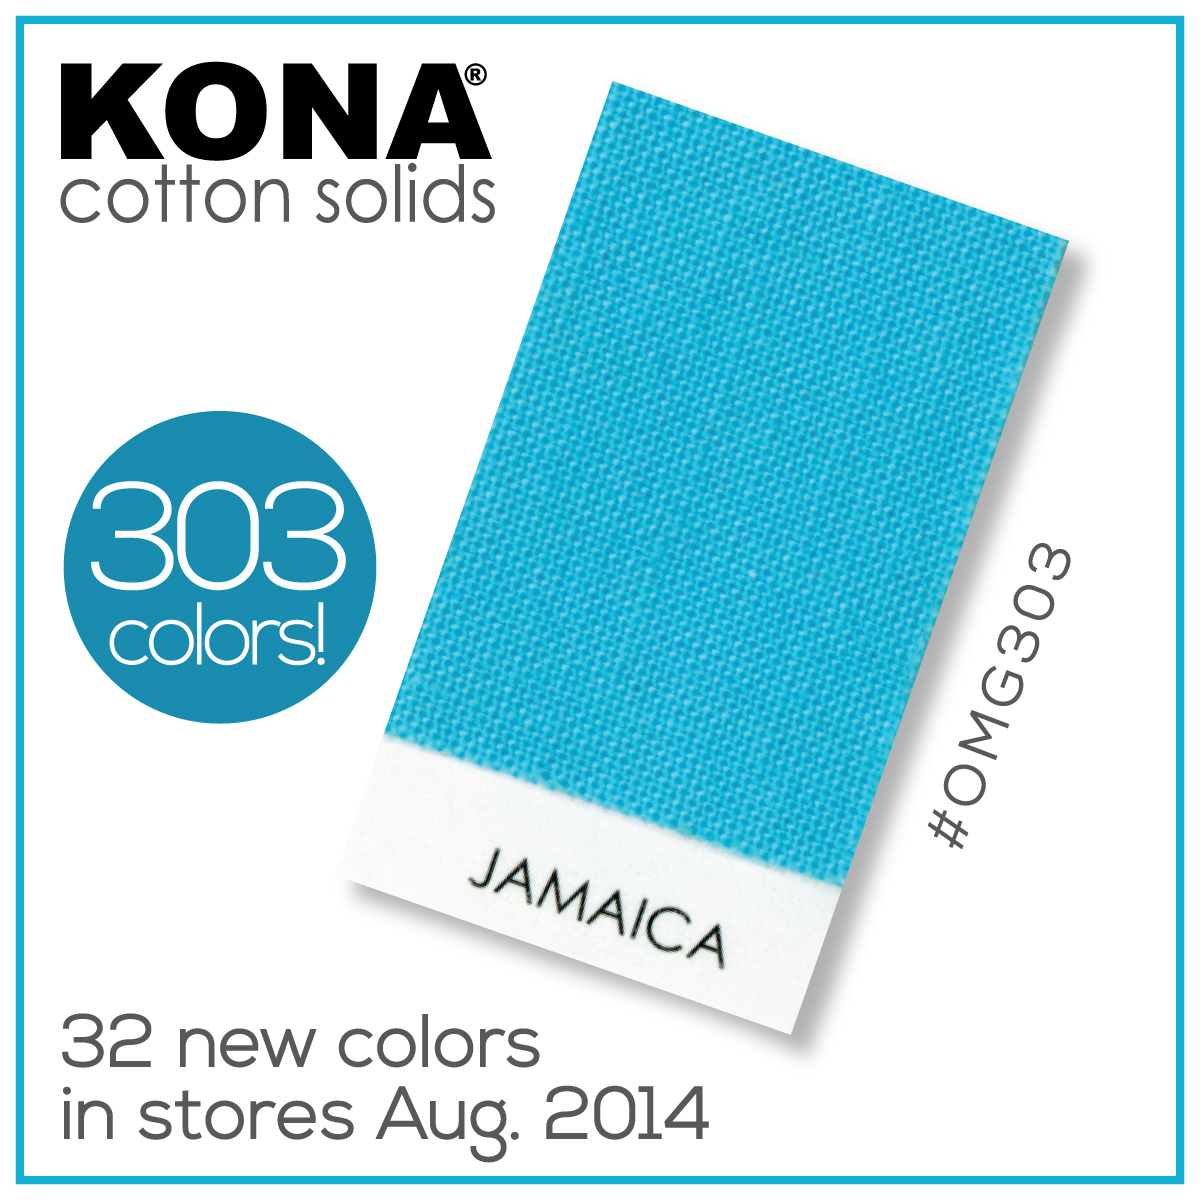 POSTED - Kona-Jamaica.jpg